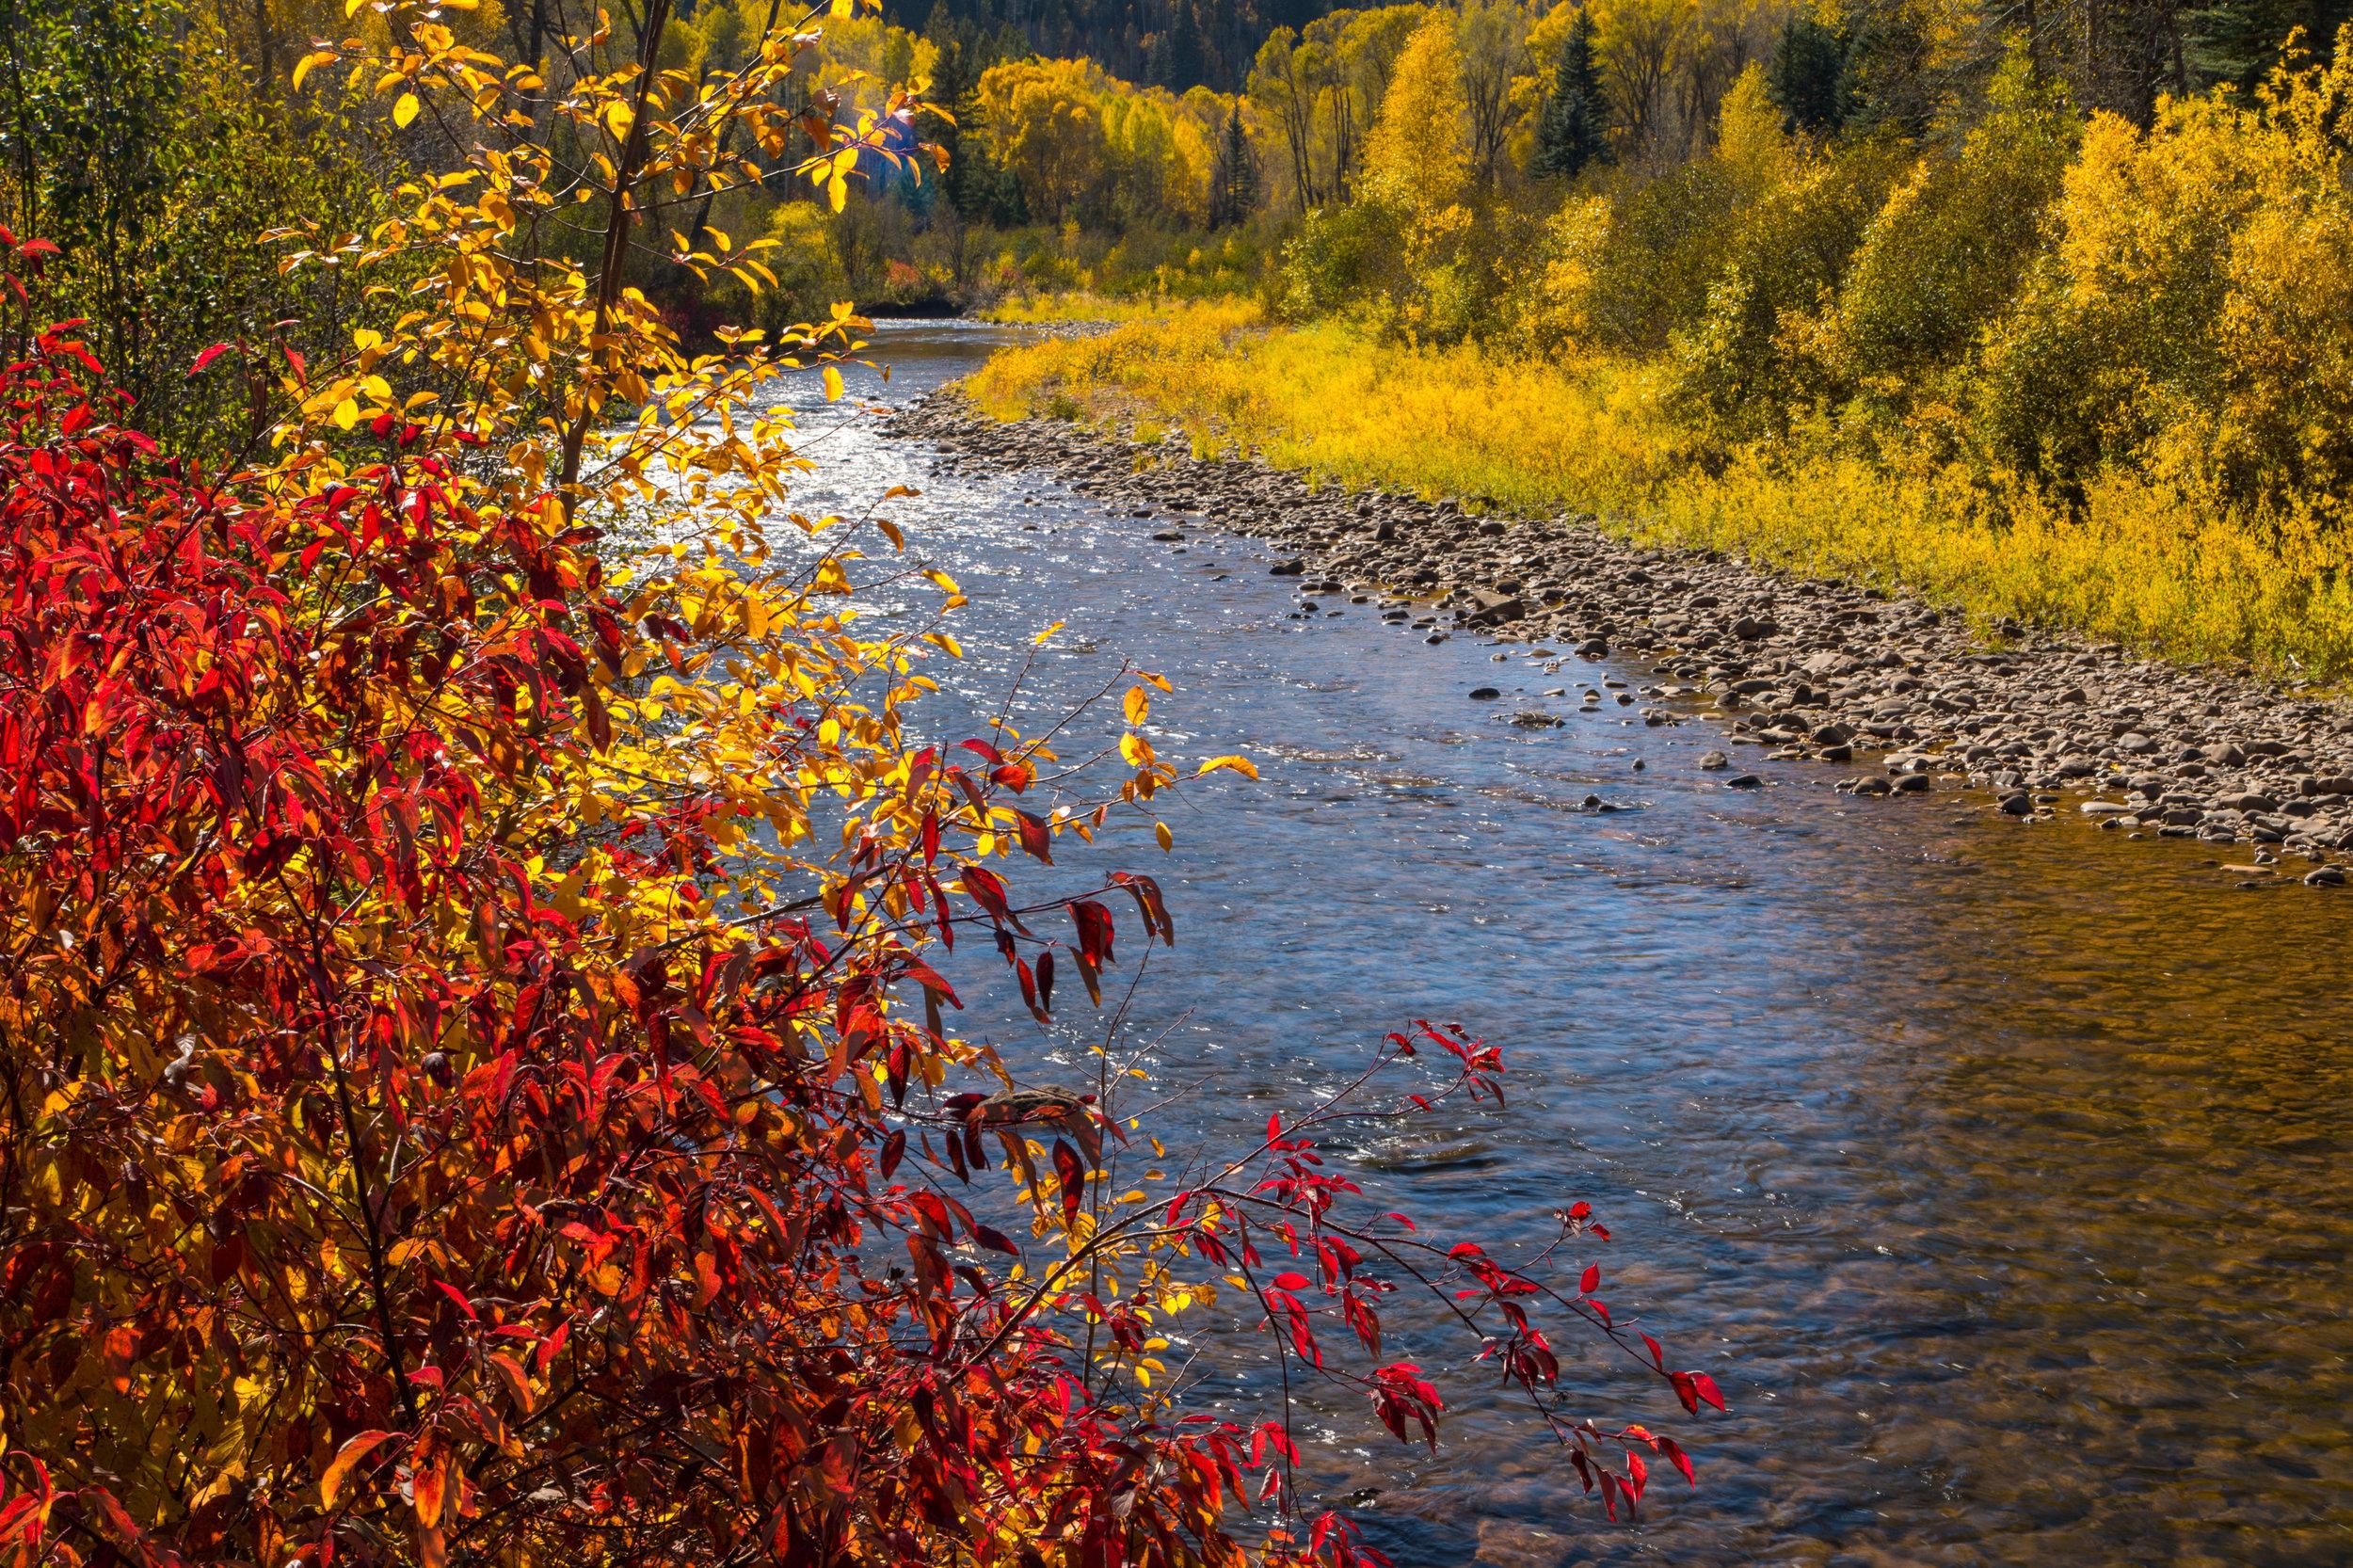 Bear Creek Trailhead, Image # 9588